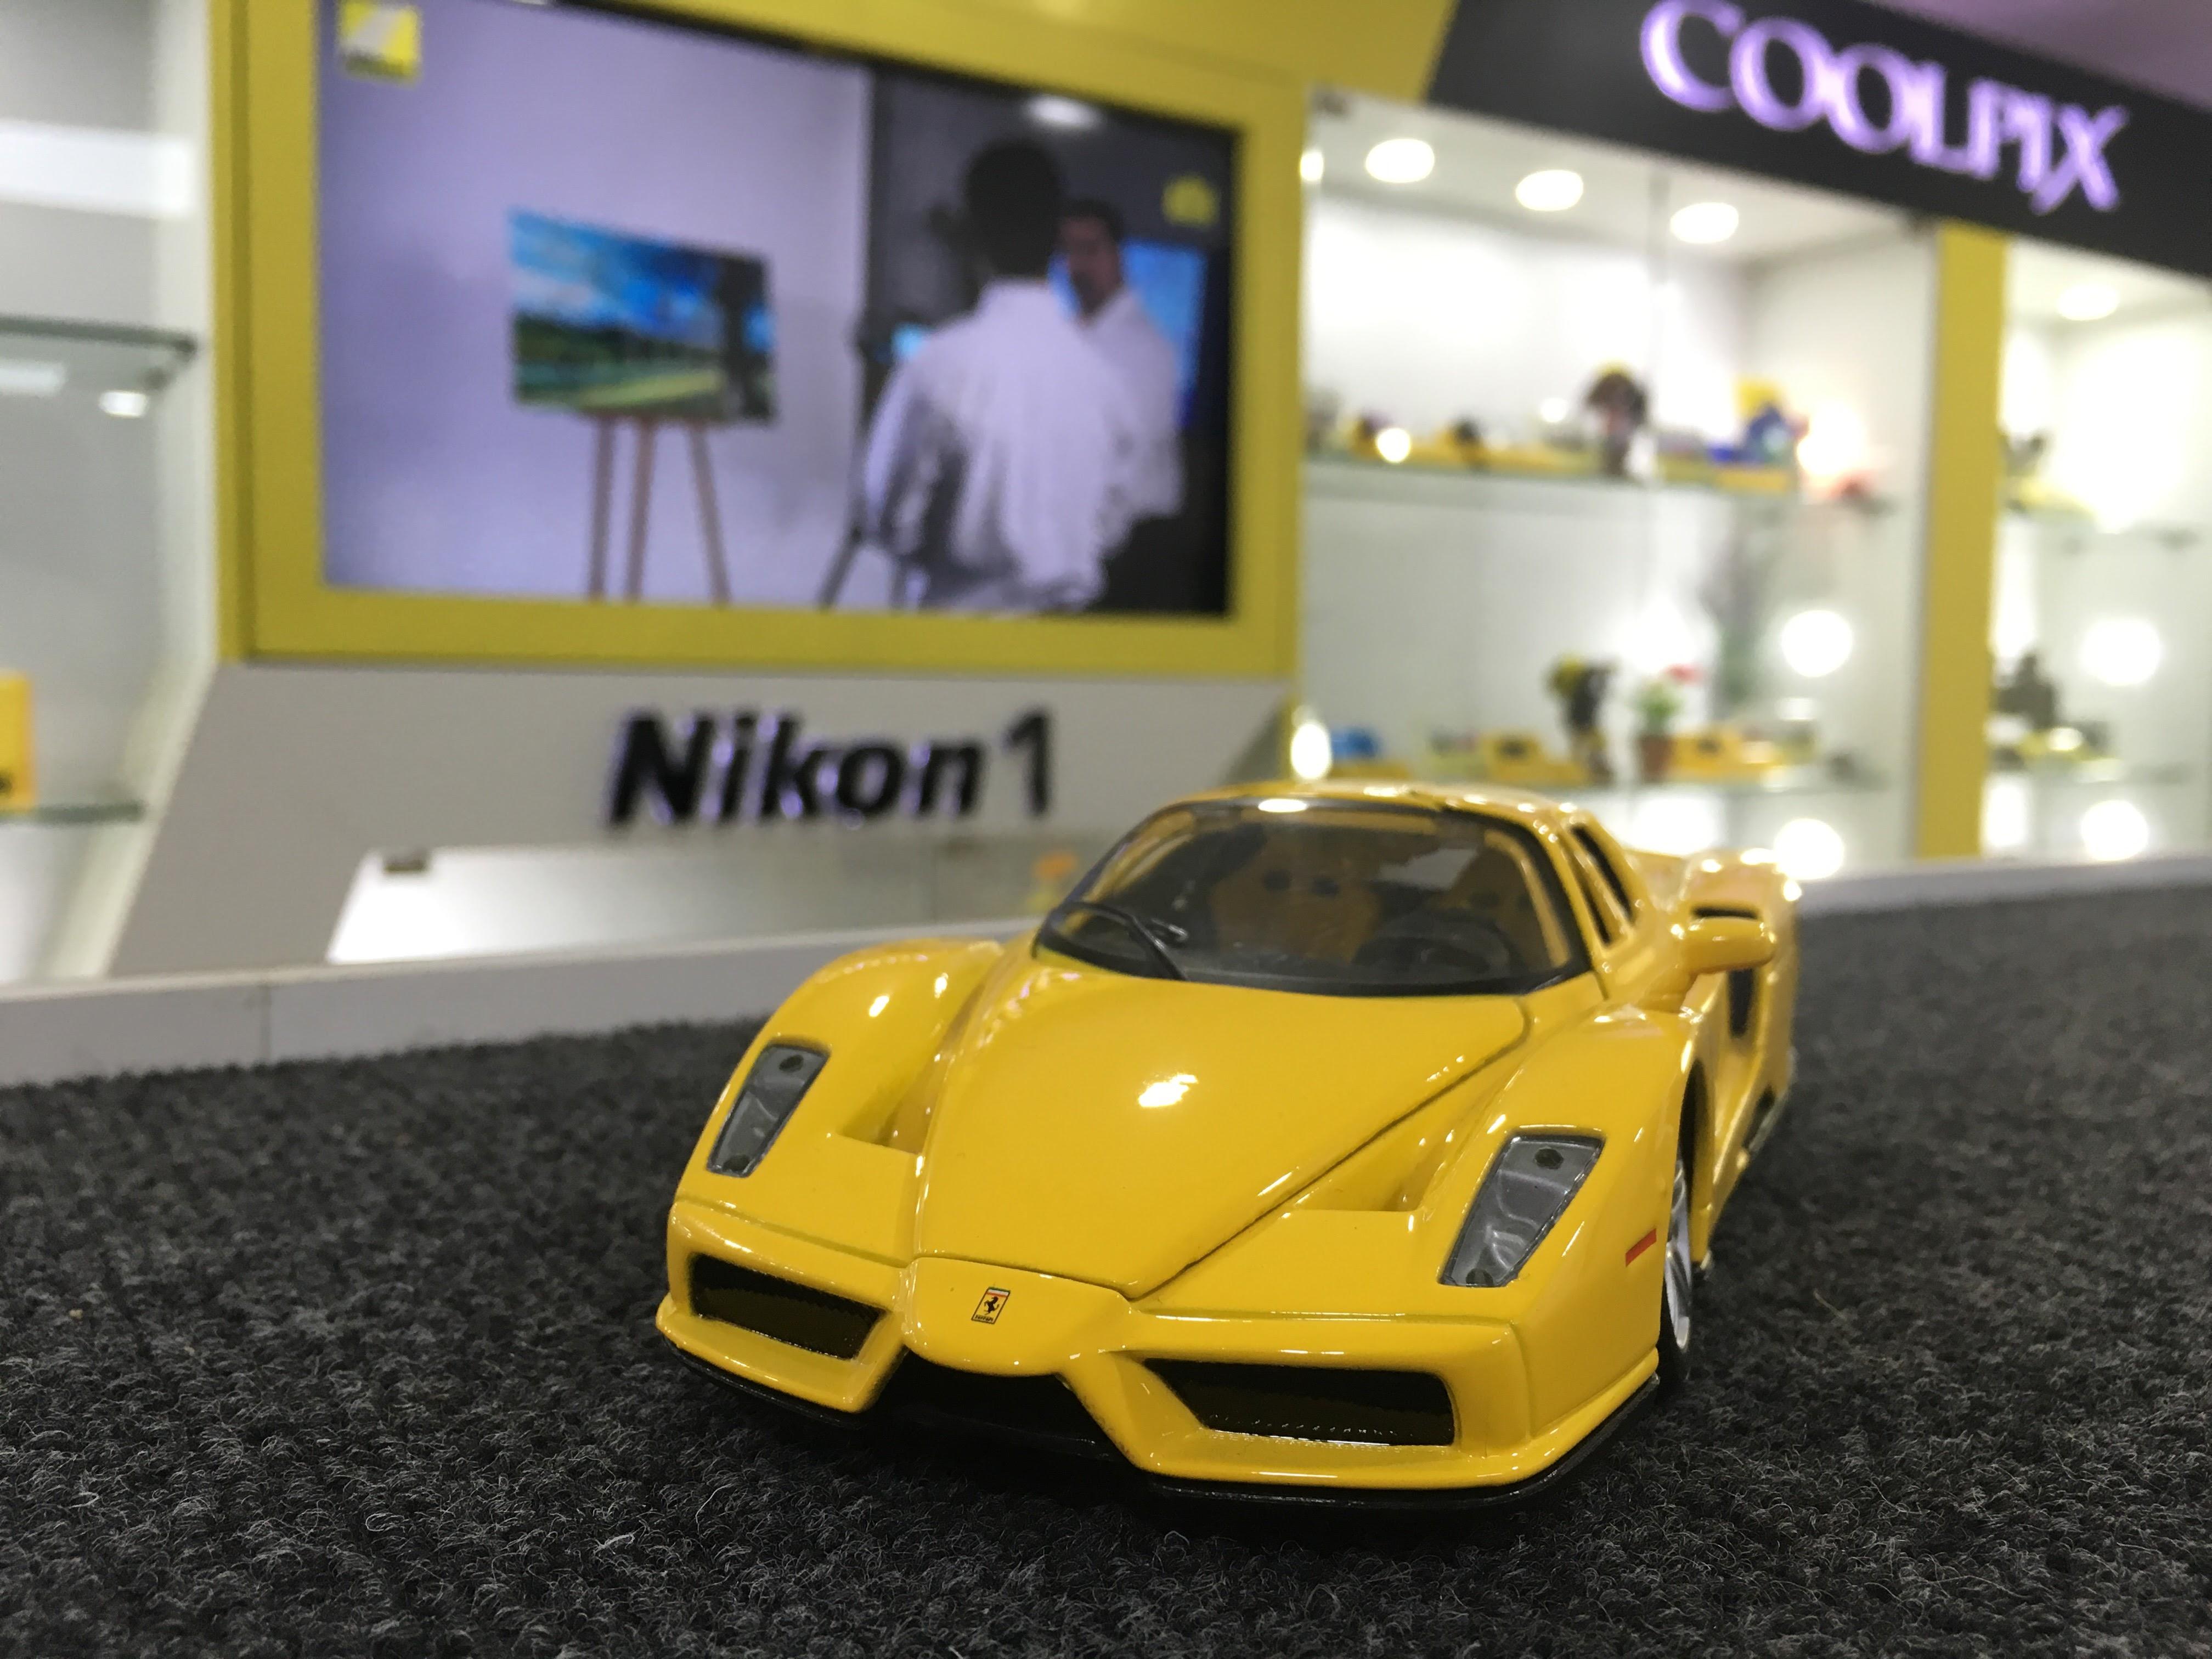 Cool Pic Of A Ferrari Toy Car